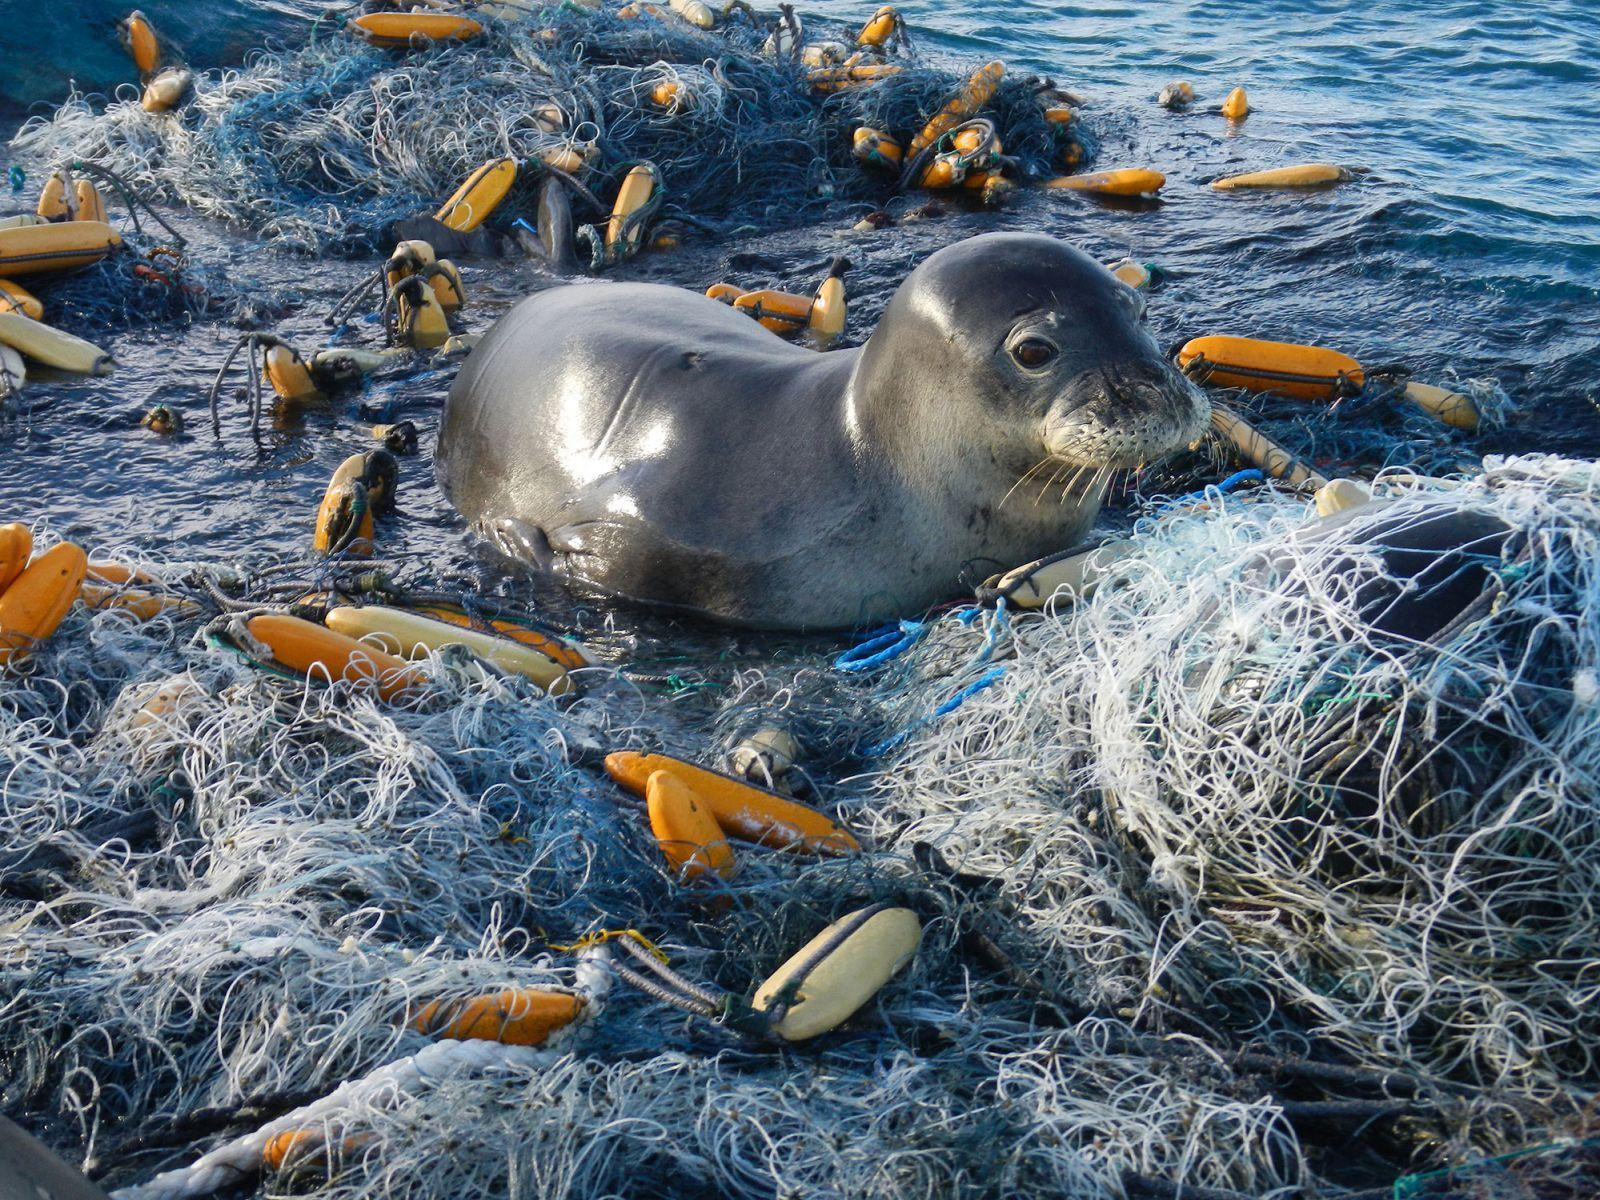 ocean-service-noaa-marine-debris